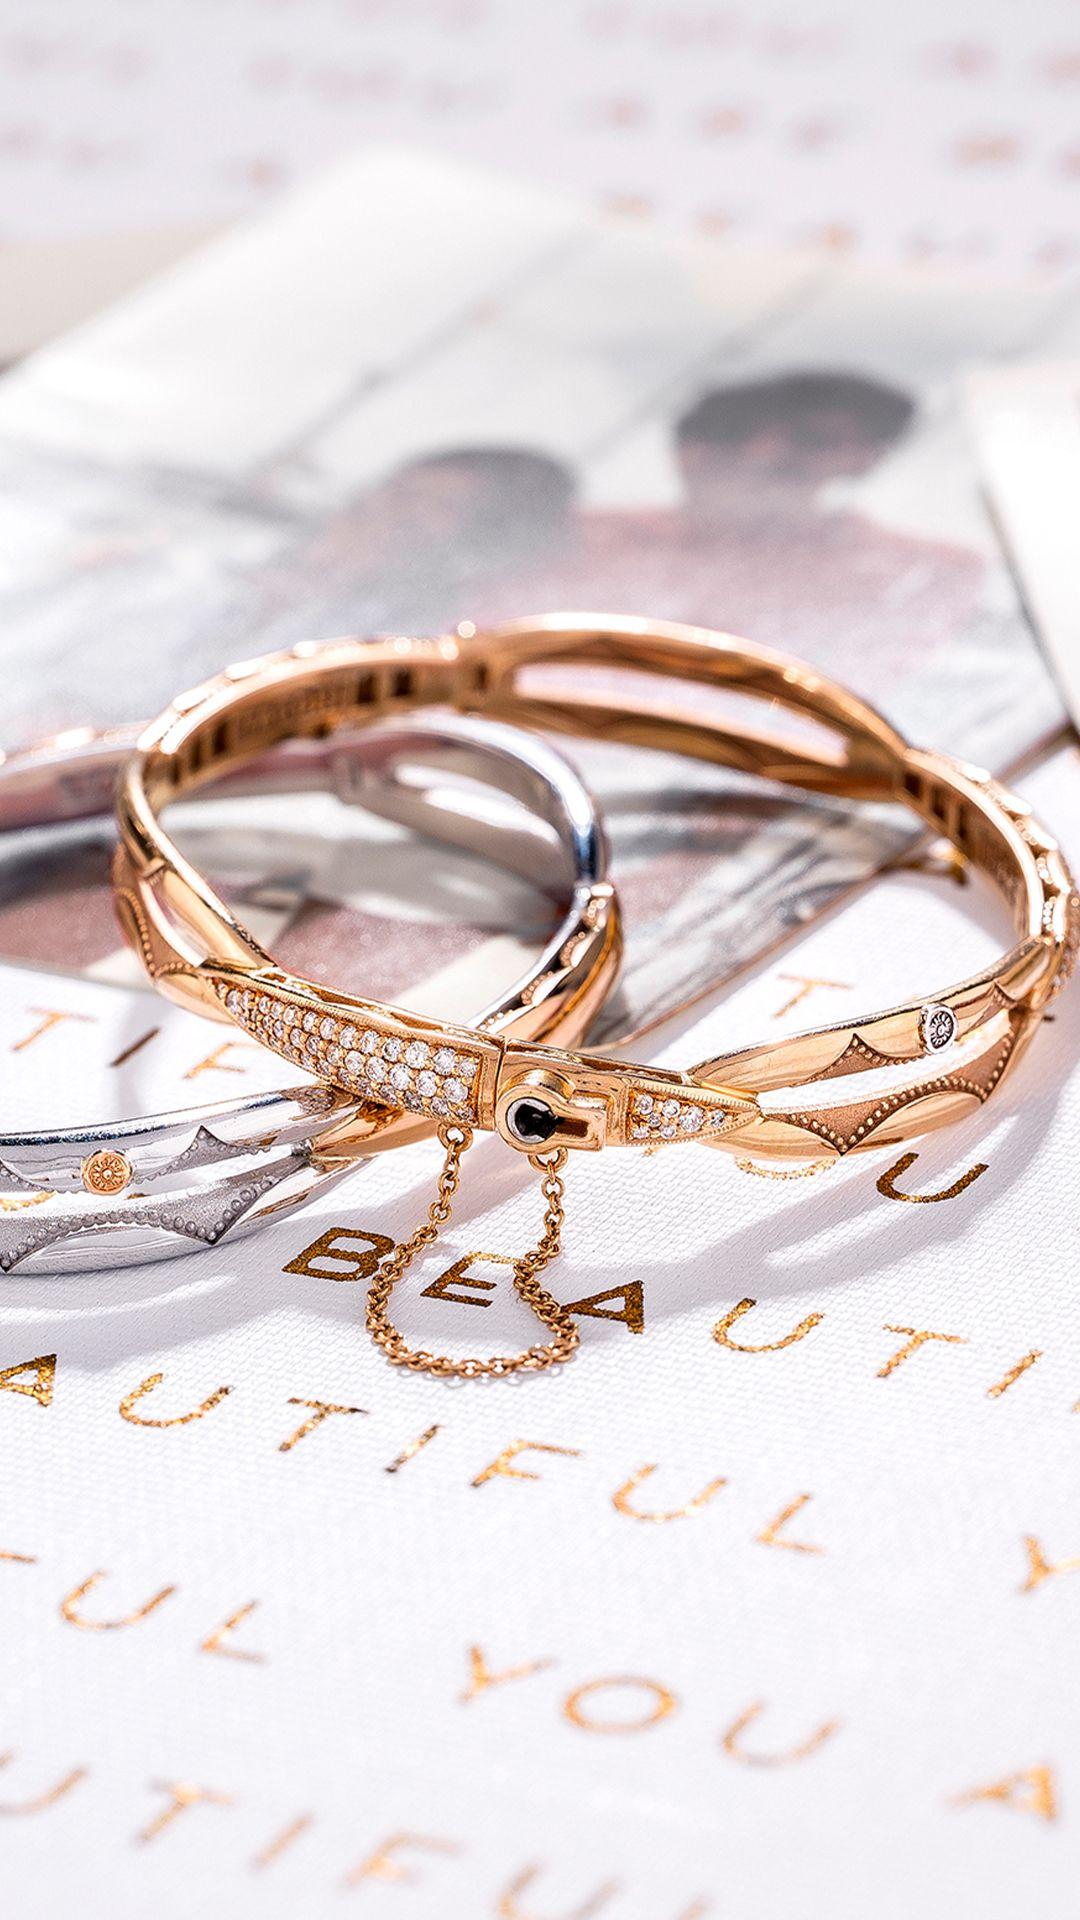 Promise Bracelet Round Rose Gold Promise Bracelet 10k Gold Bracelet Rose Gold Bracelet